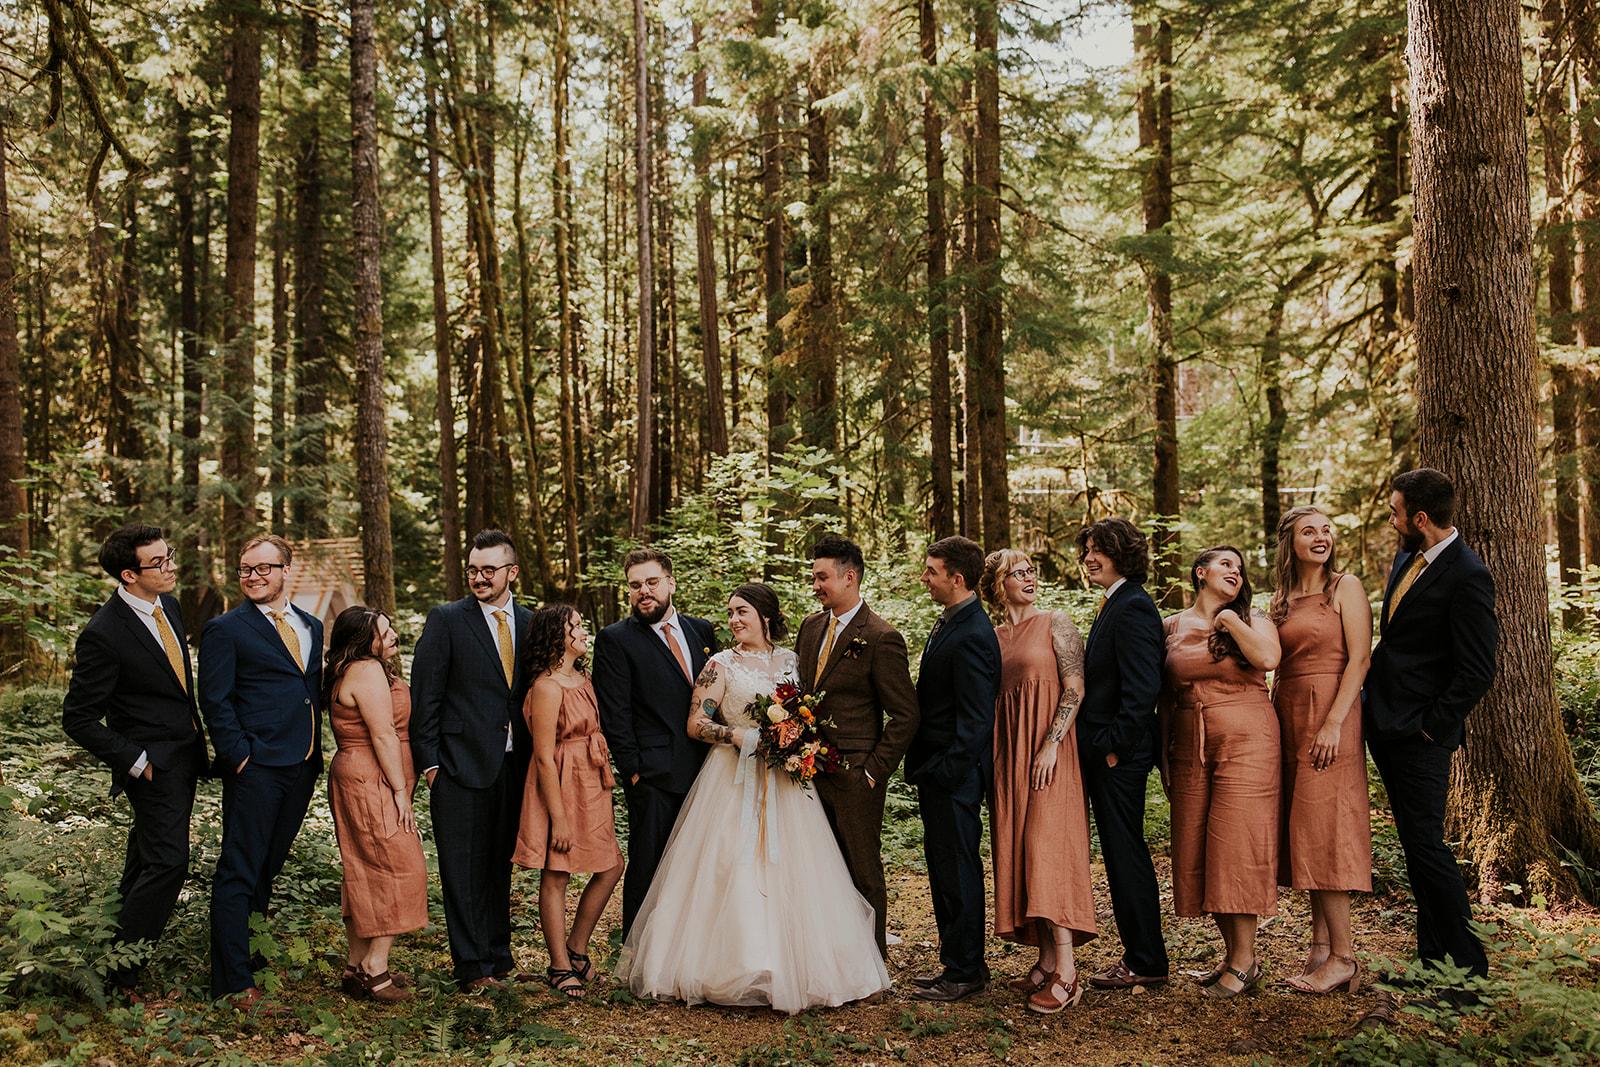 Avalon Gunnar Wedding Party.jpg